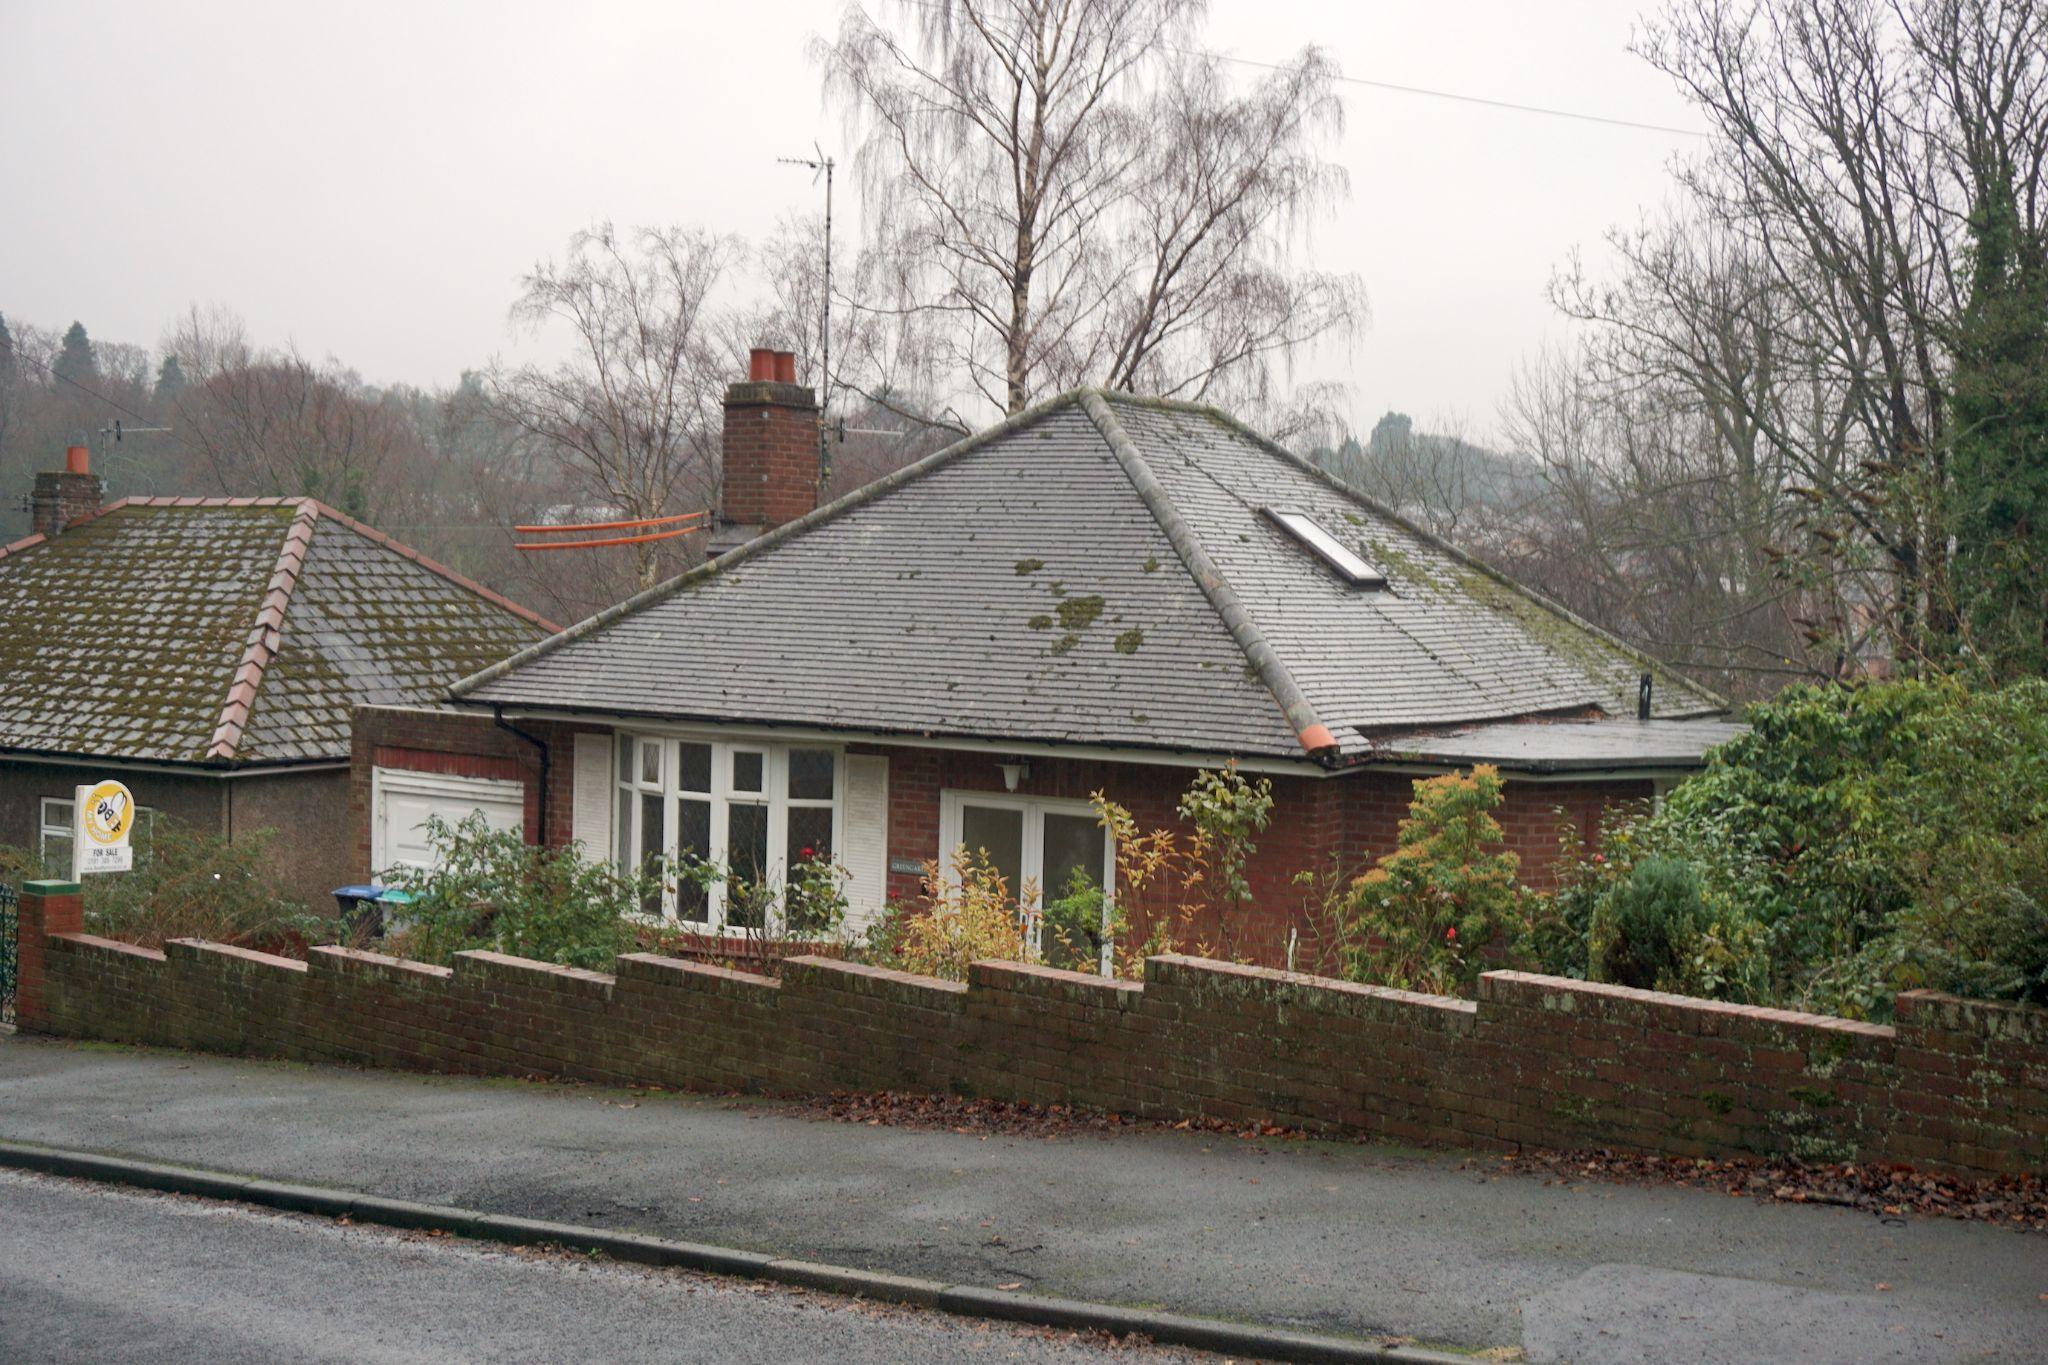 2 Bedroom Detached Bungalow For Sale - Front Exterior